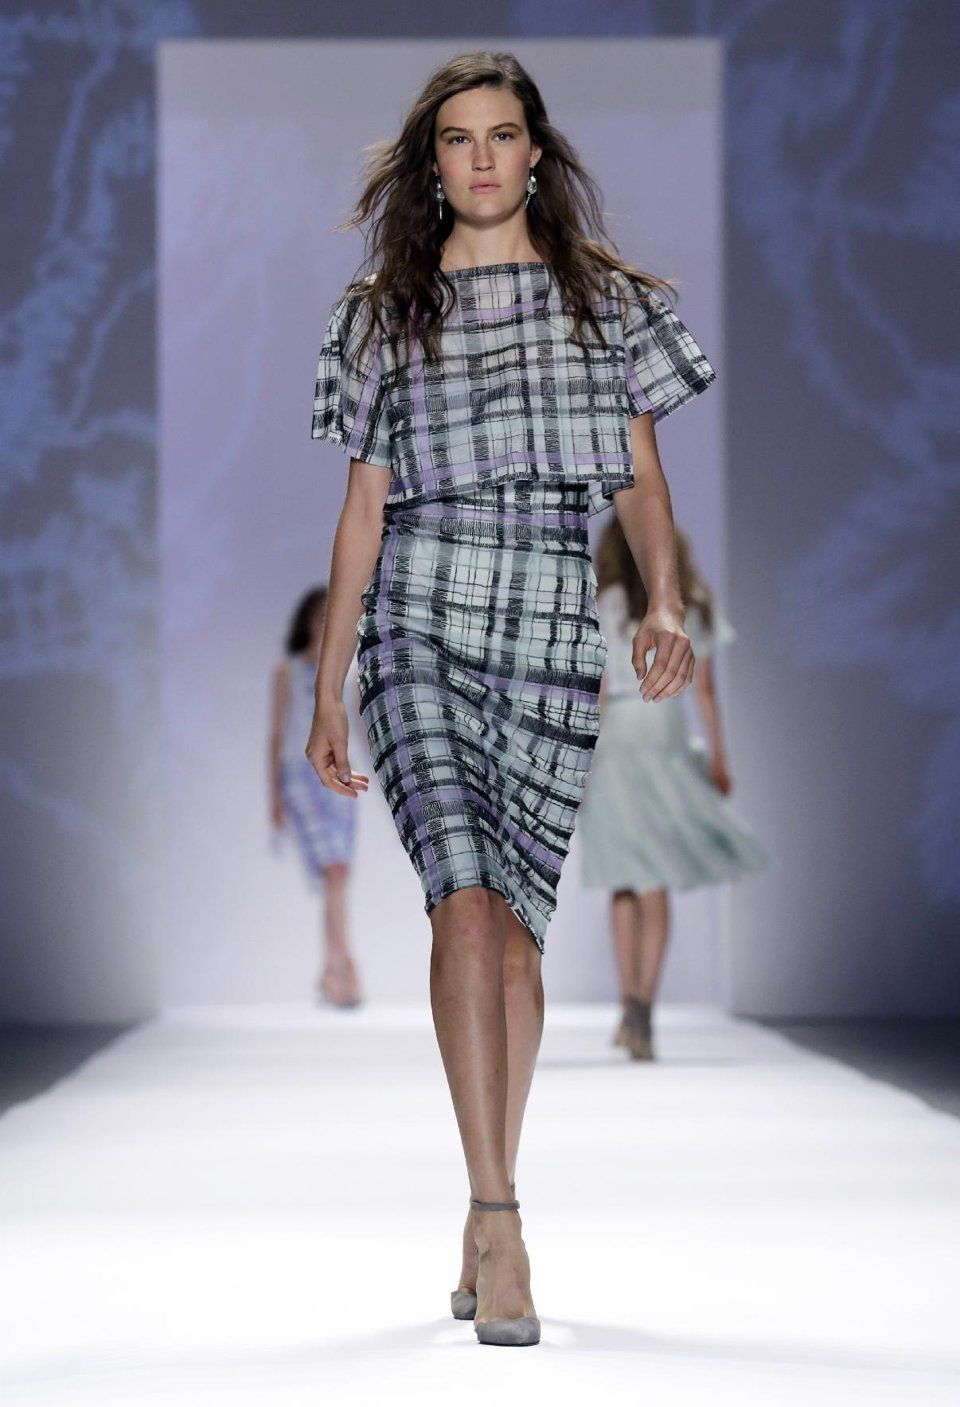 The Tadashi Shoji Spring 2014 collection is modeled during Fashion Week in New York, Thursday, Sept. 5, 2013. (AP Photo/Richard Drew)